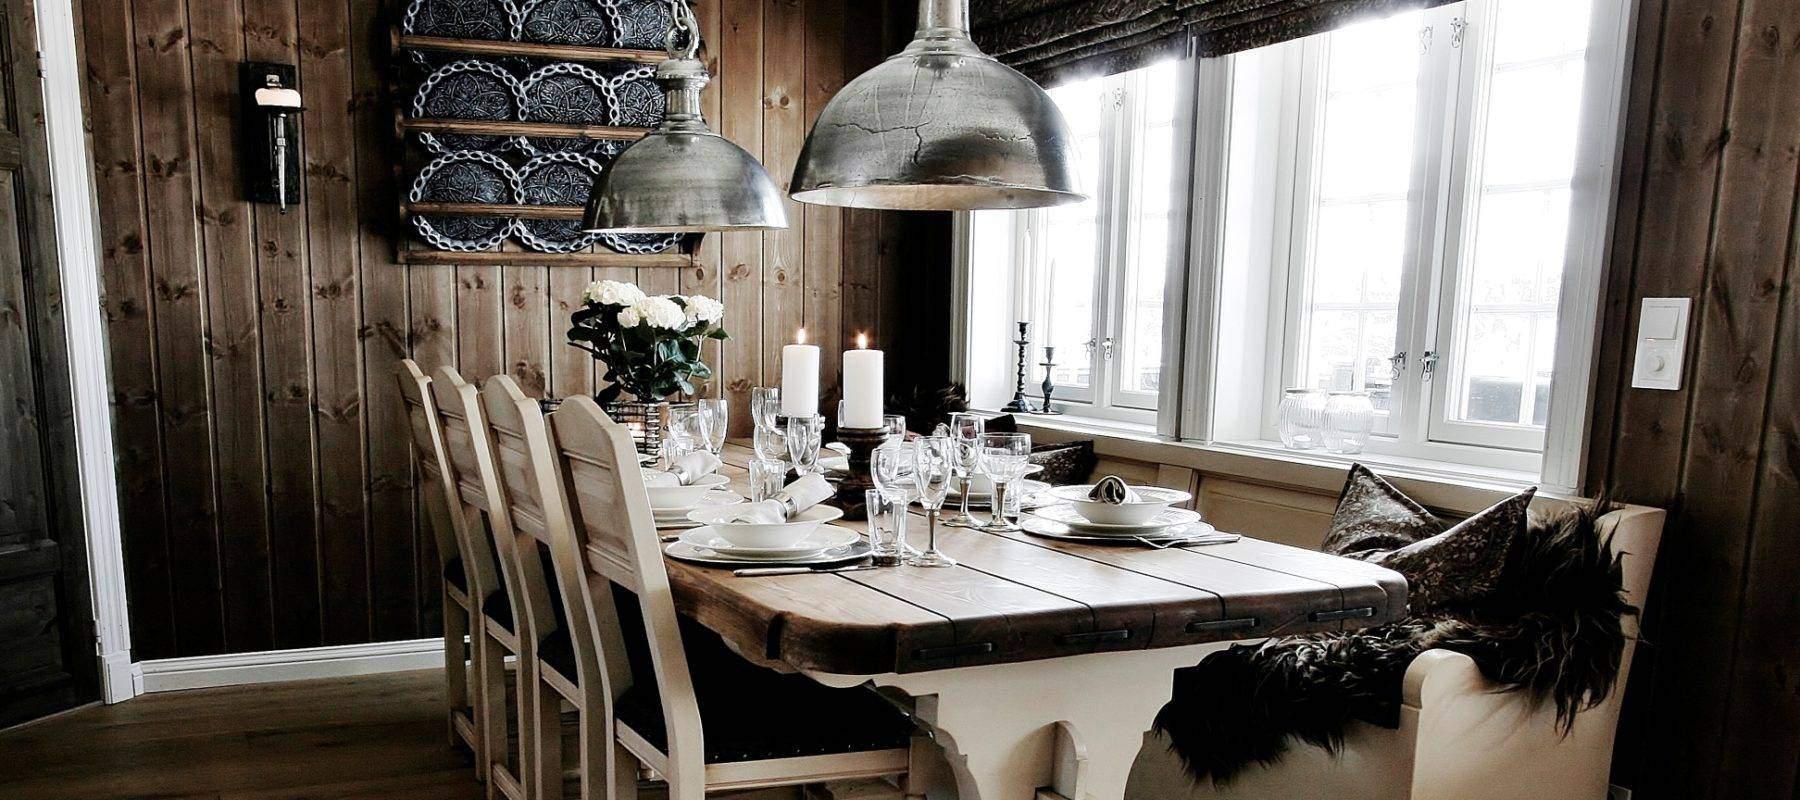 2915 Hytteinteriør hytte Gålå – Snøtind 114